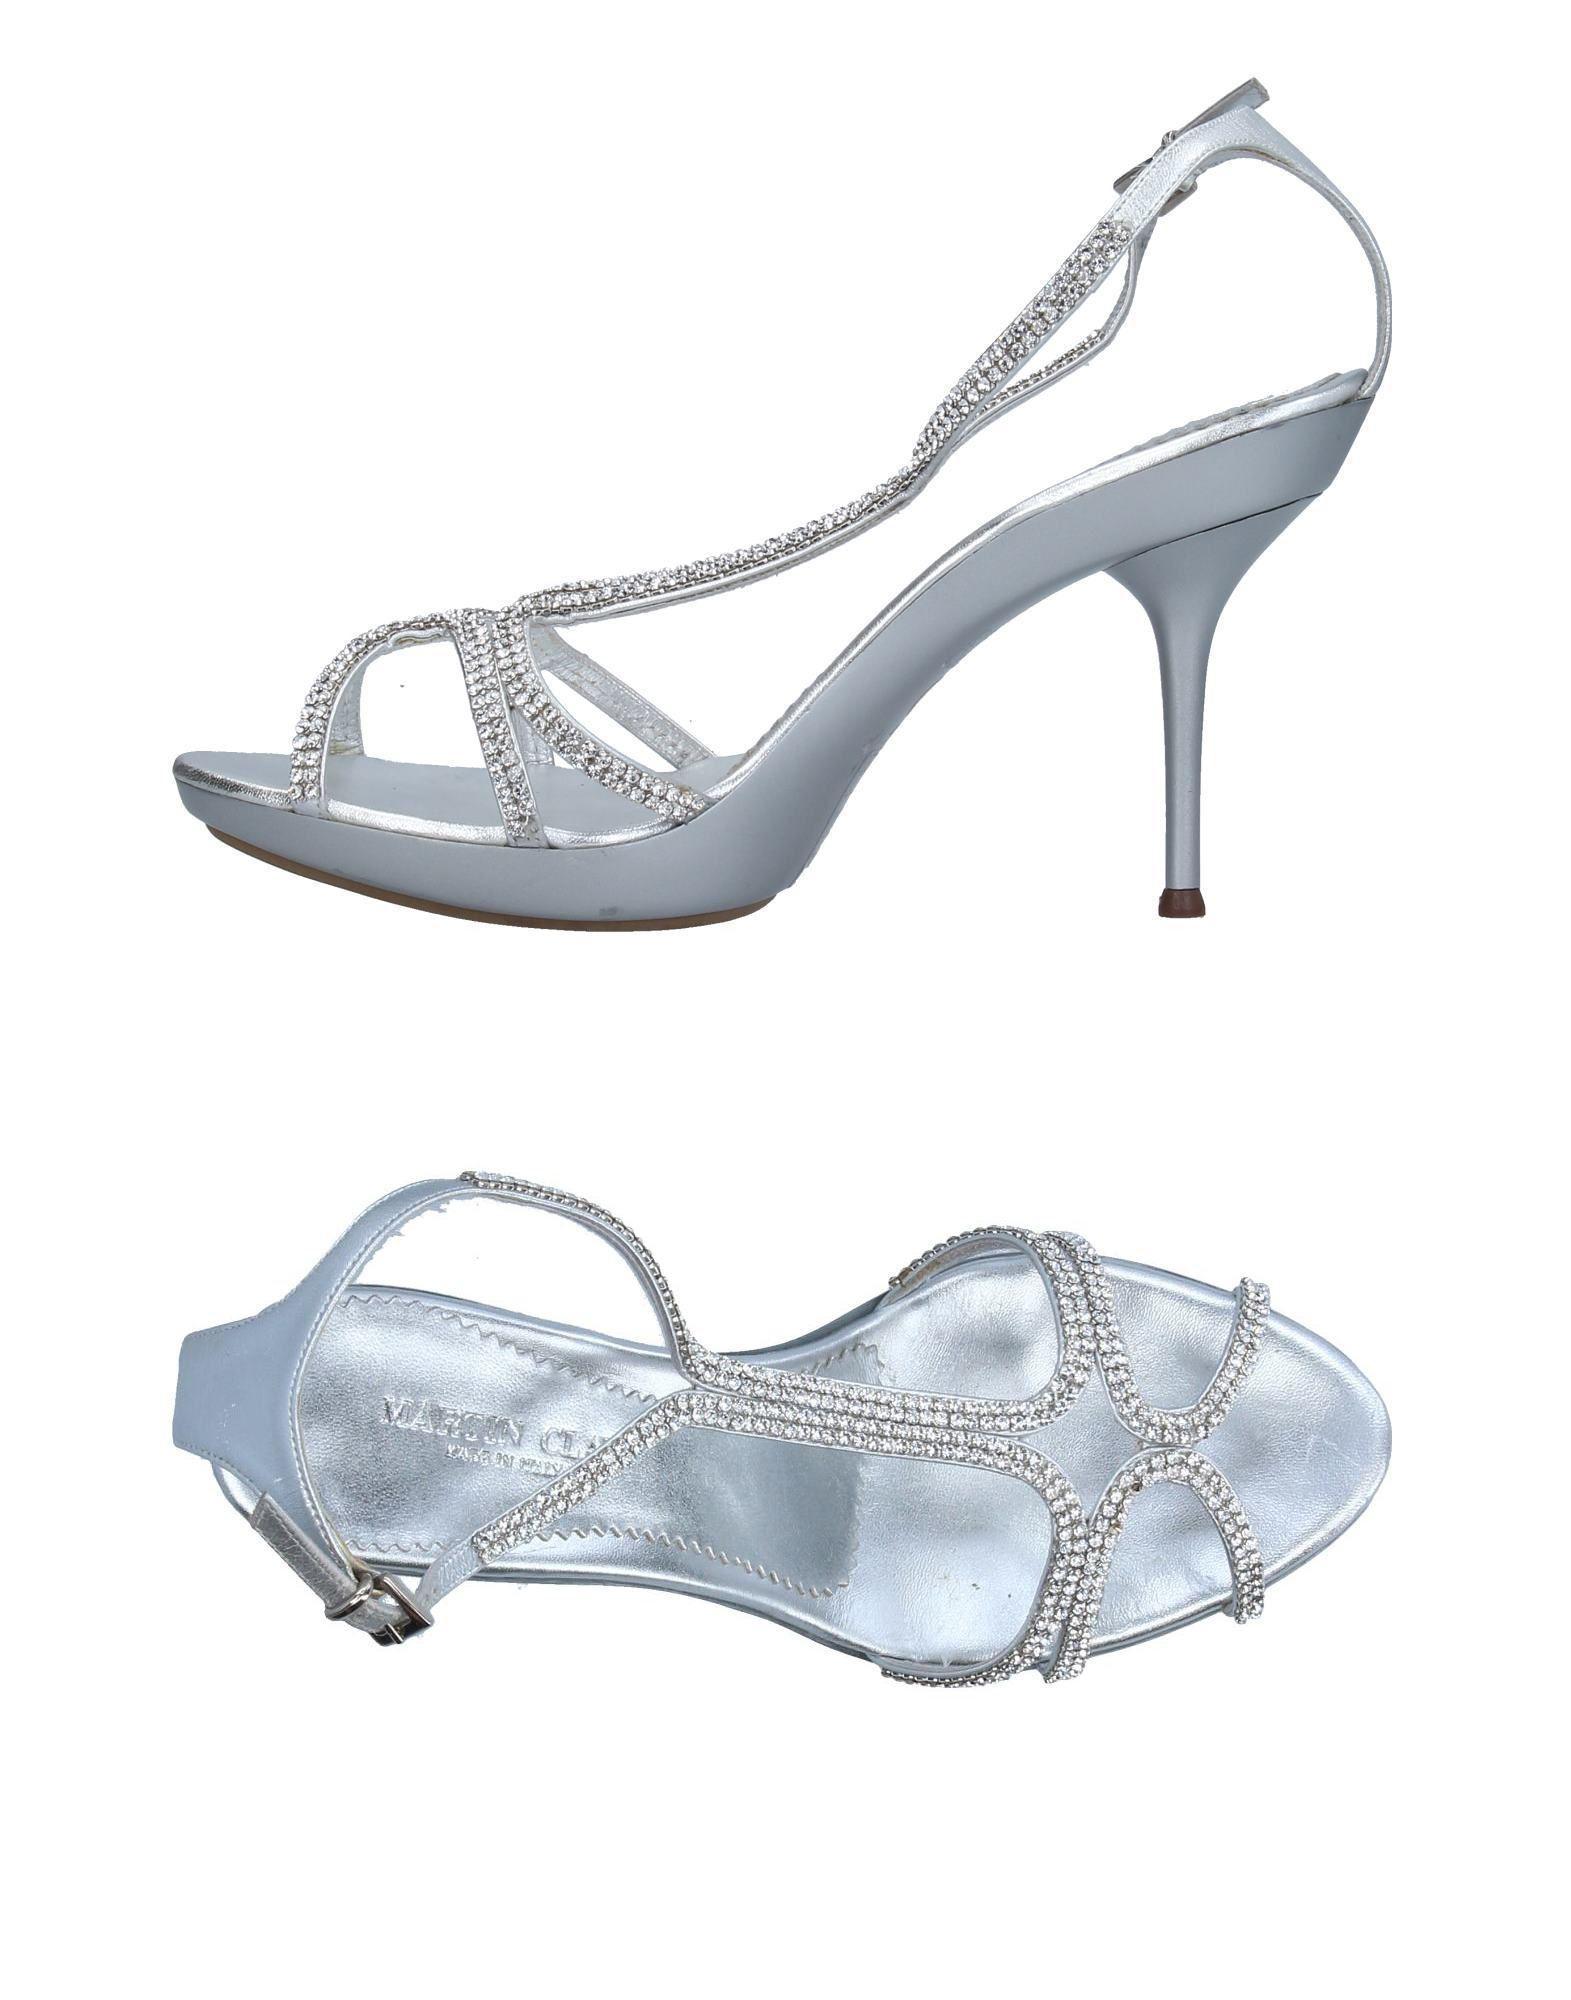 FOOTWEAR - Sandals Martin Clay hPIrRzkj